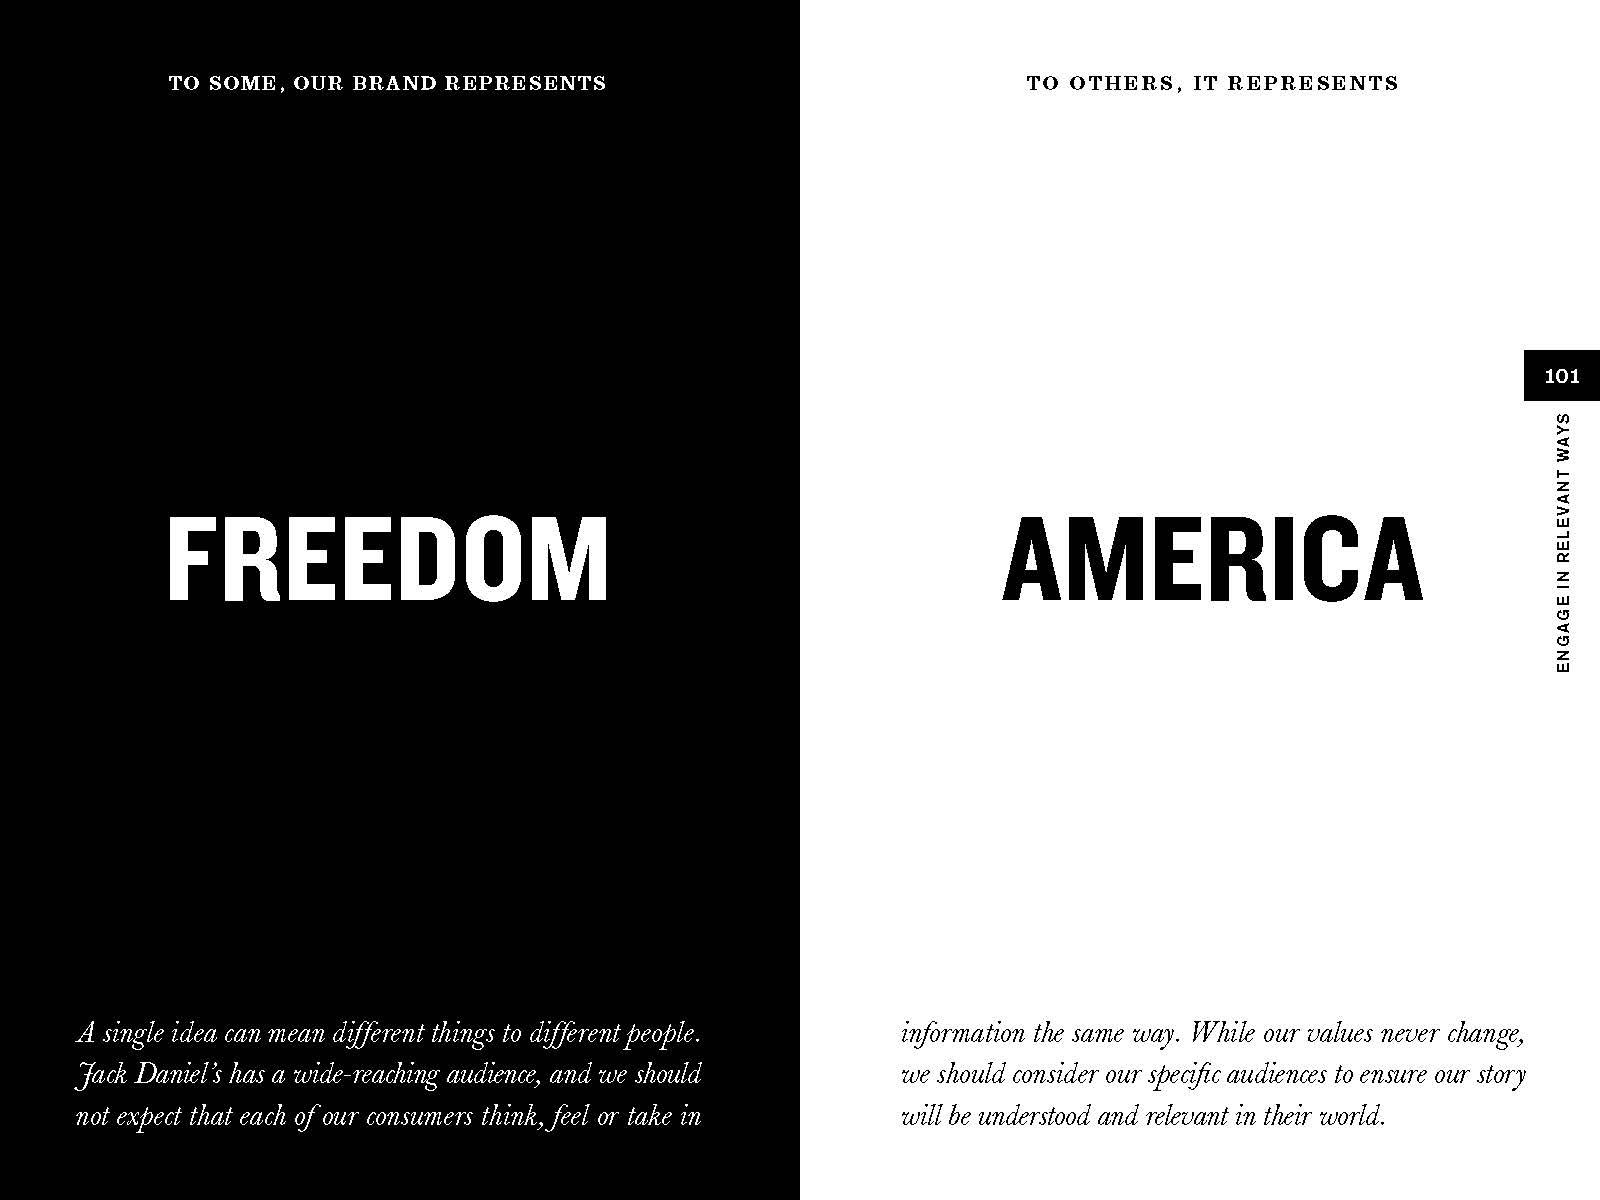 Jack Daniel's Guiding Principles 2012_Page_54.jpg